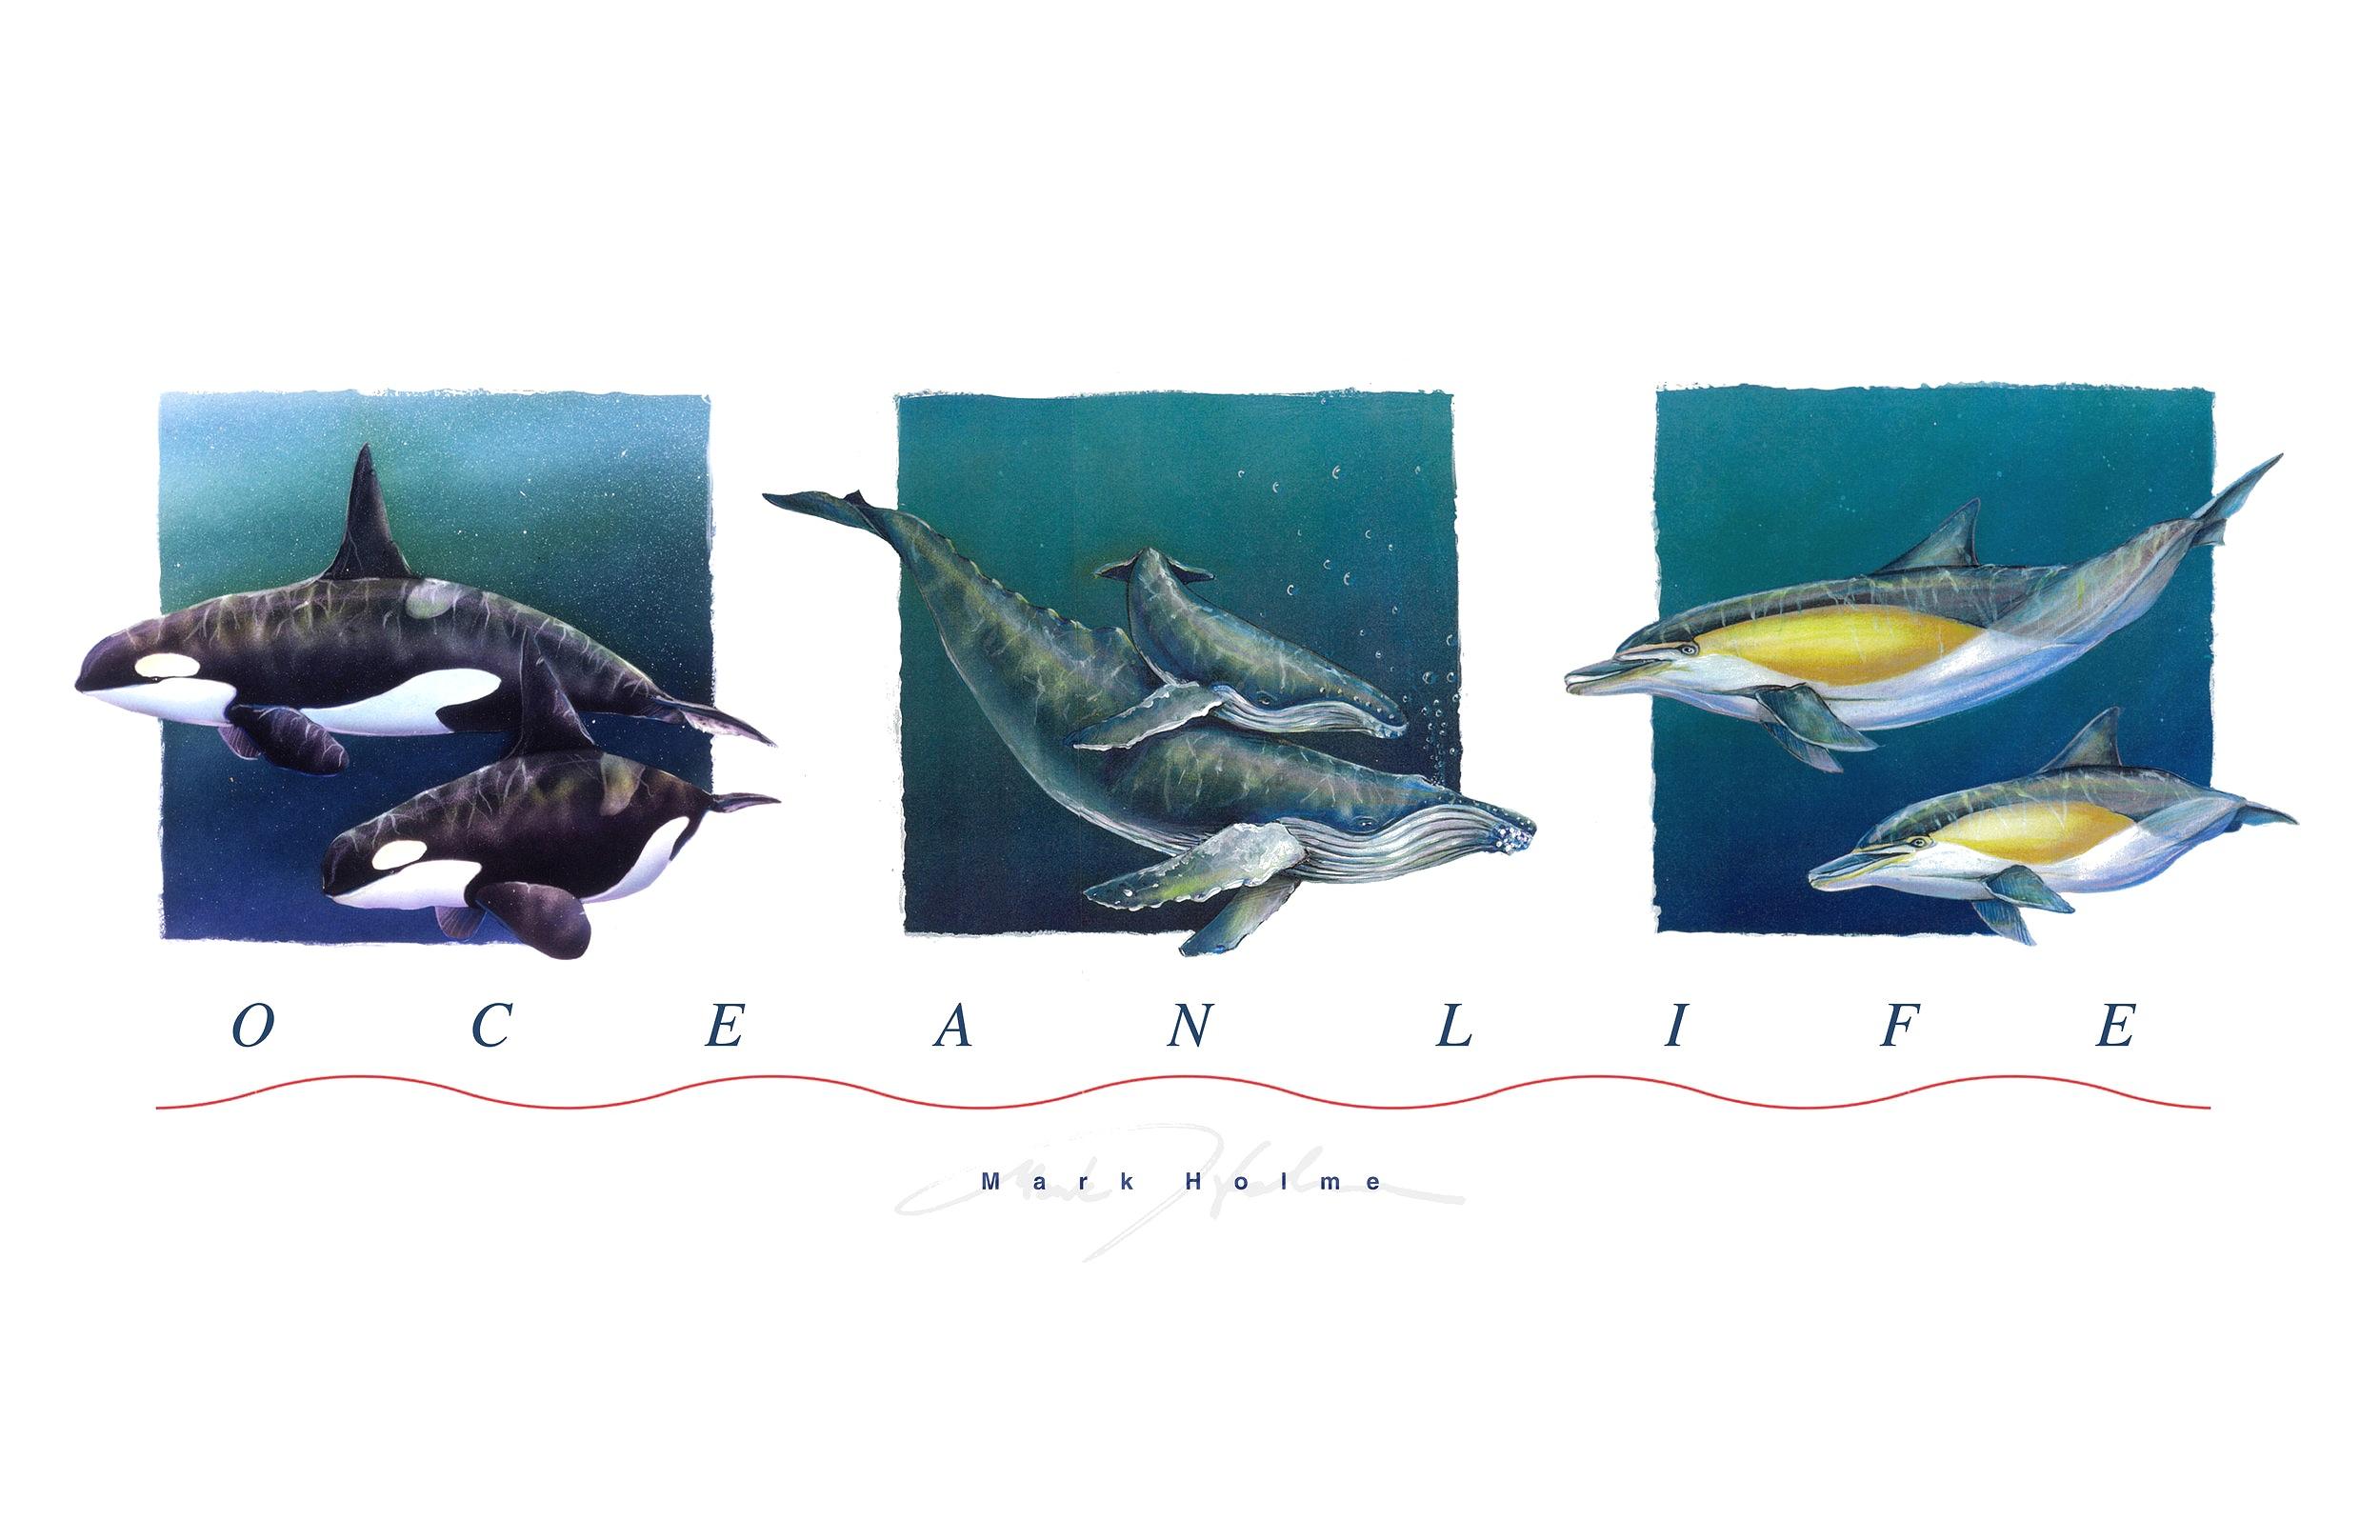 fwhales-1.jpg